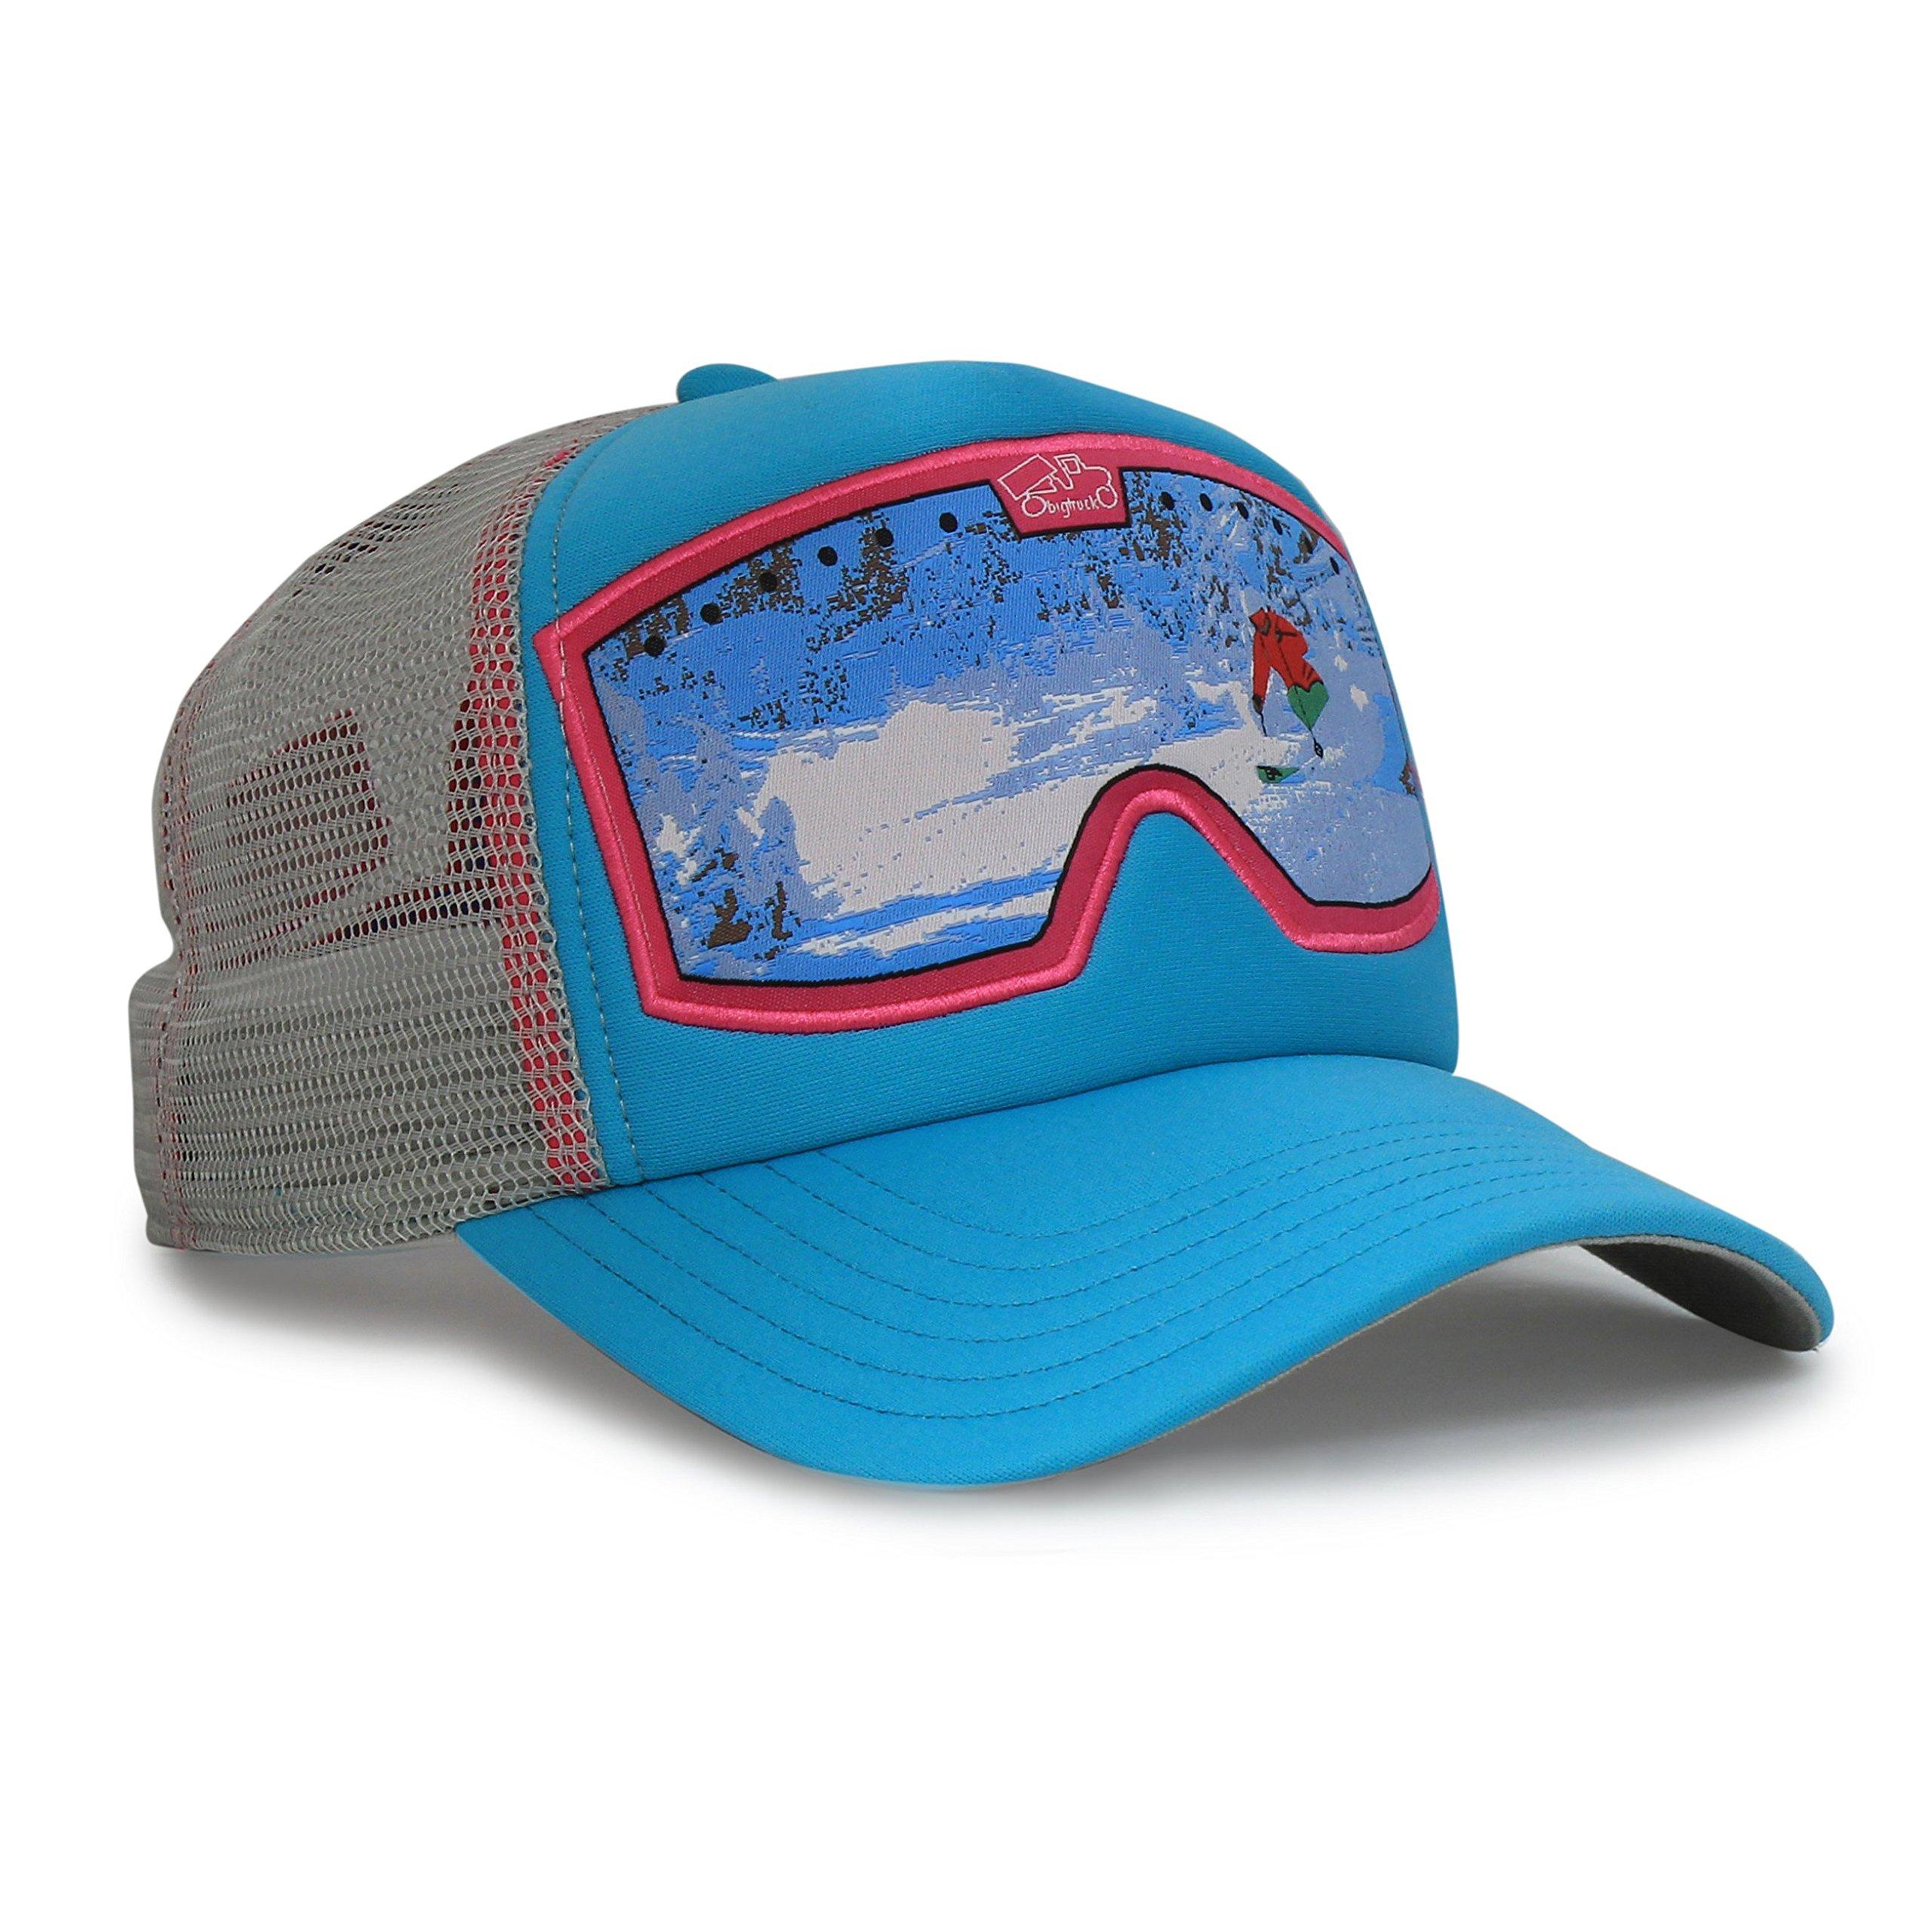 bigtruck Original Kids Mesh Snapback Kids Trucker Hat, Goggle Jade